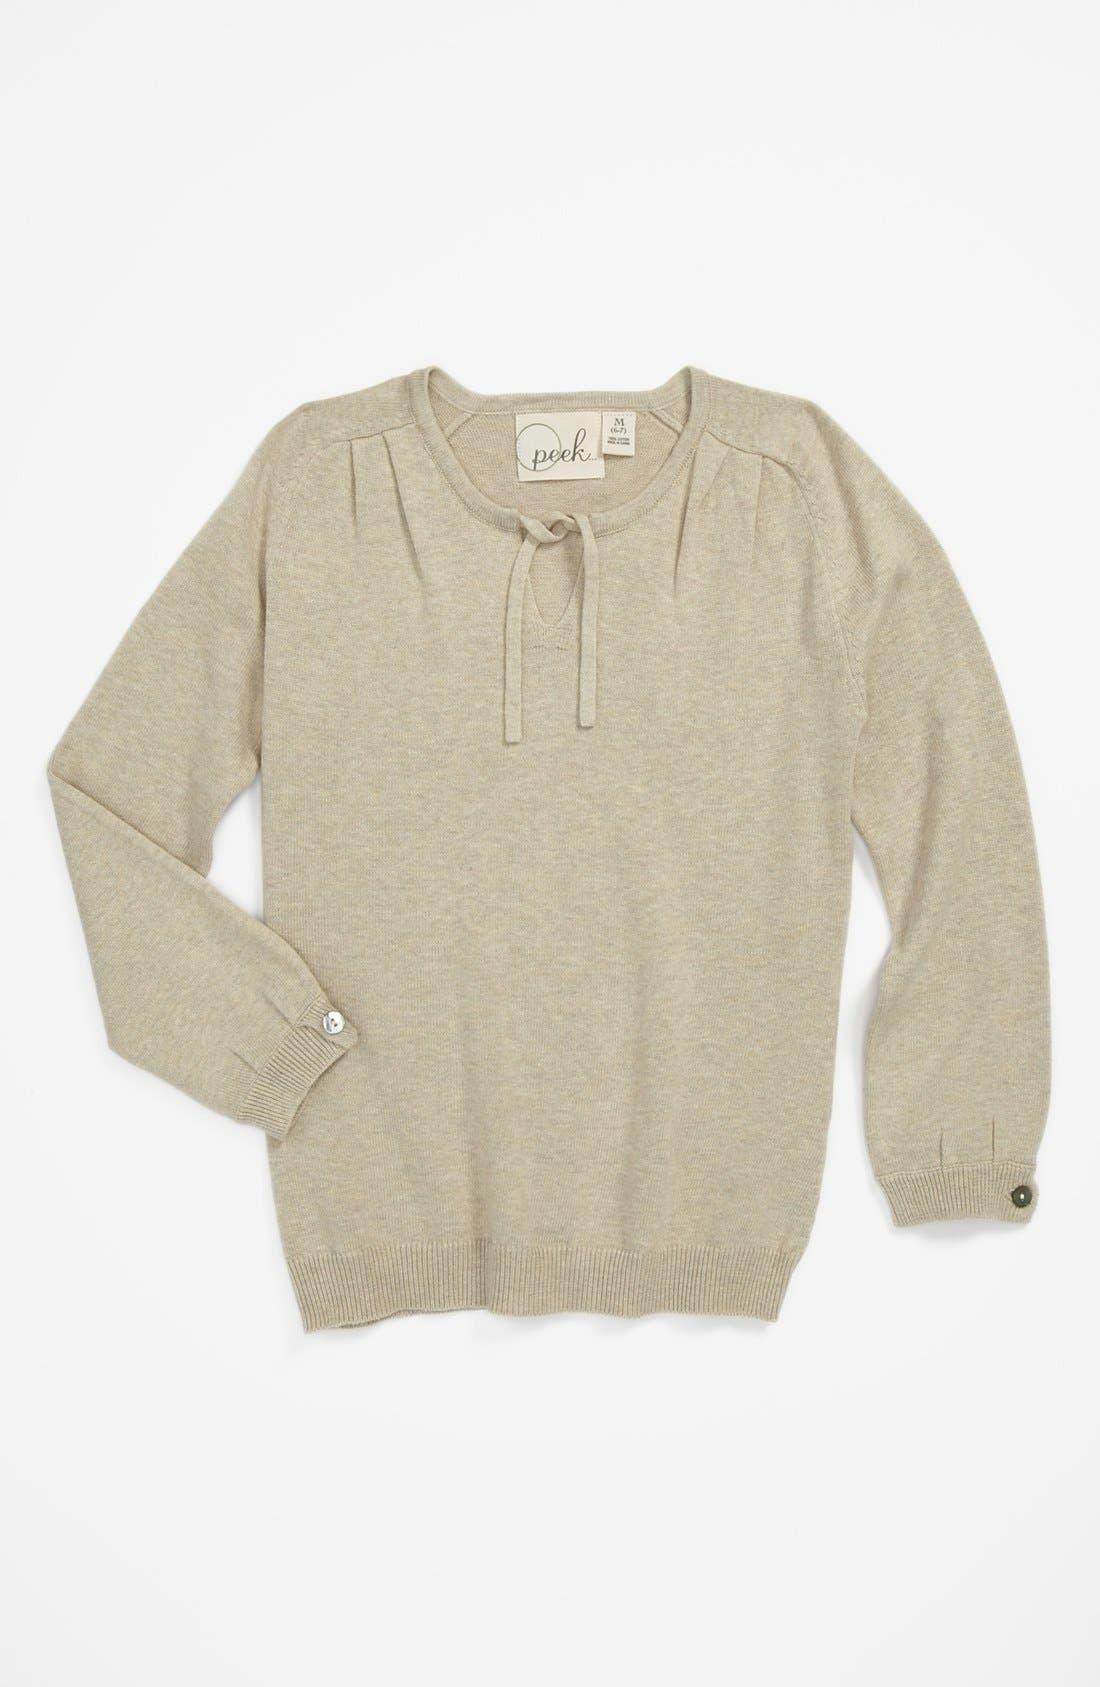 Main Image - Peek 'Rosa' Sweater (Big Girls)